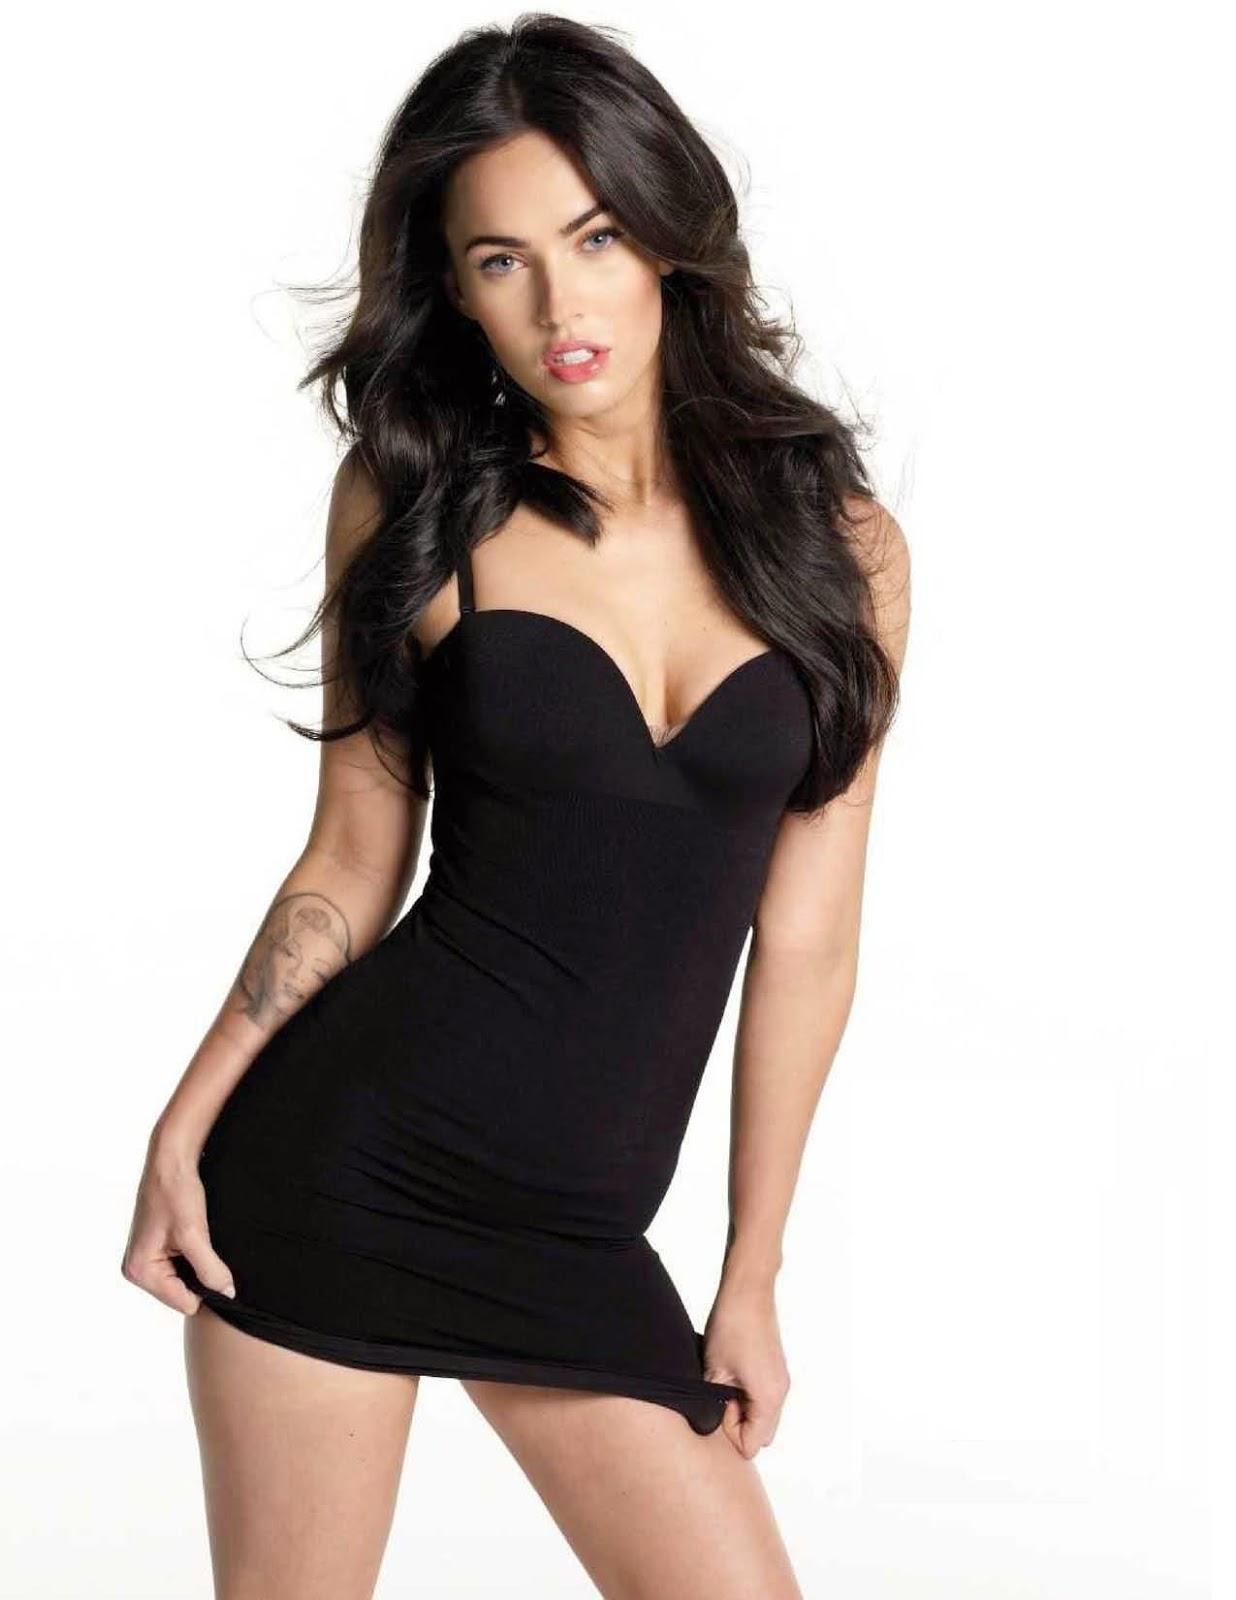 Hot Teen Babe Megan 33